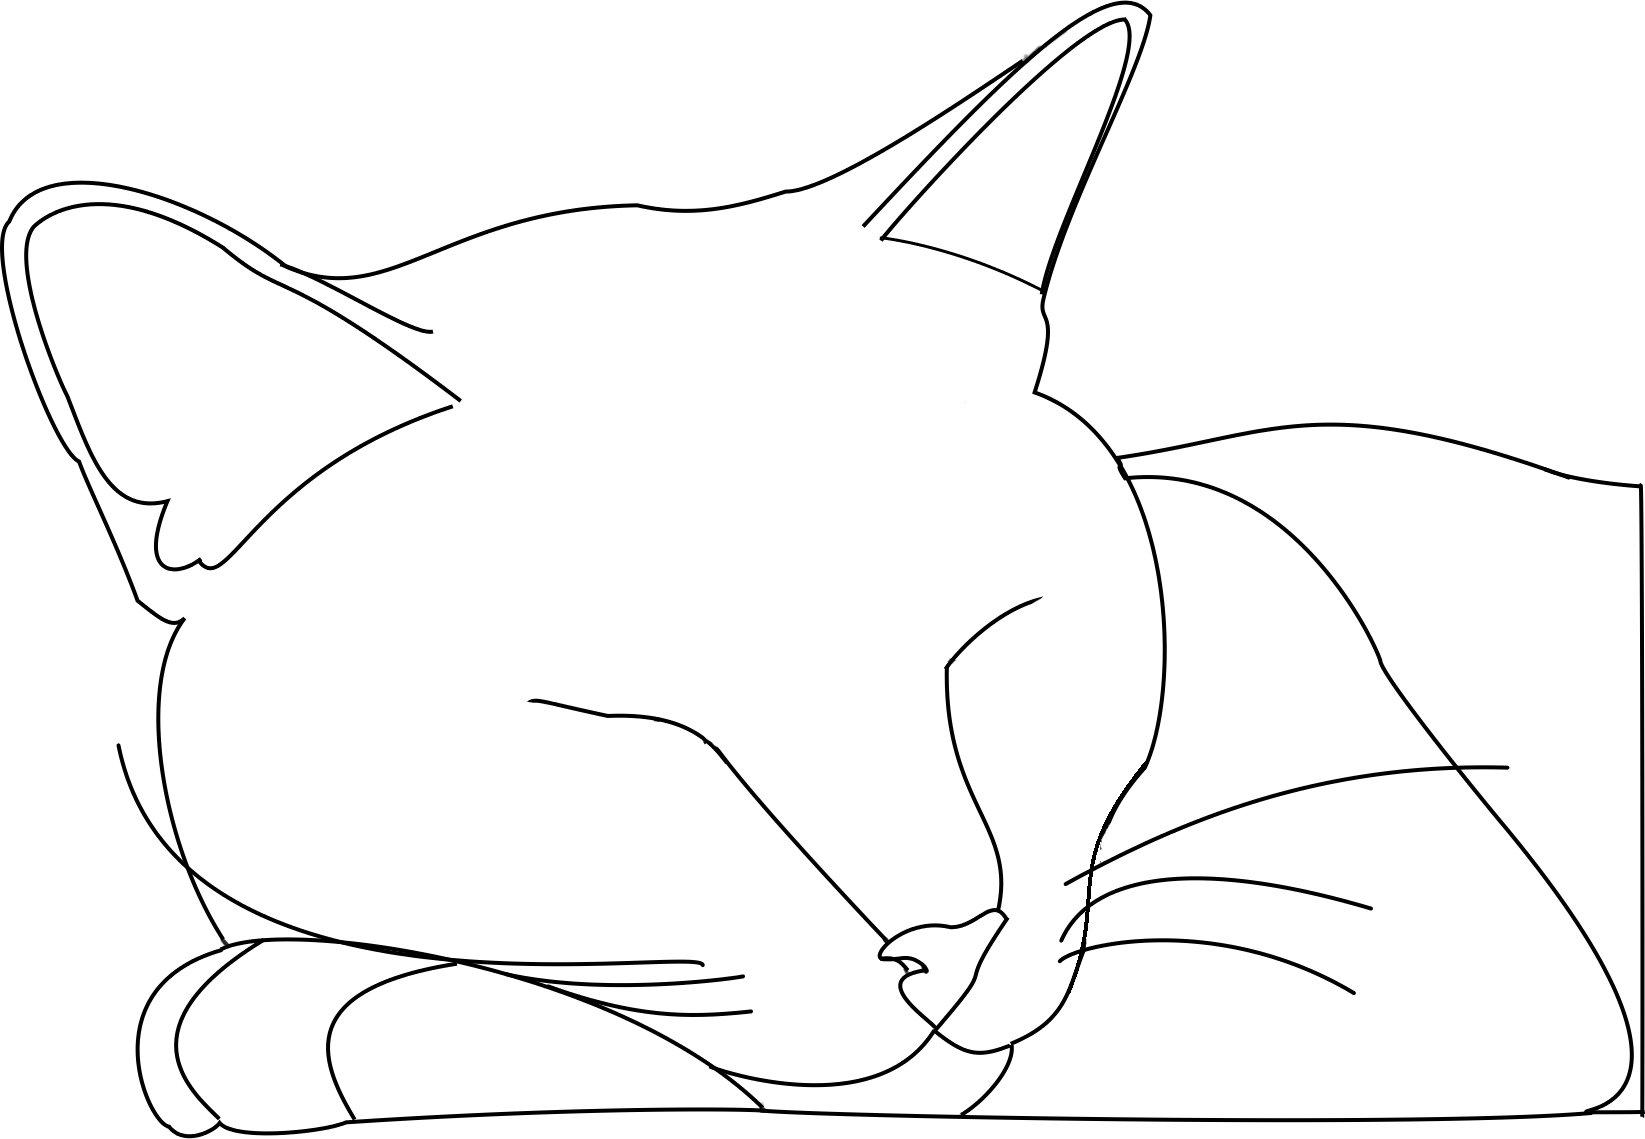 1645x1139 Cat Outline Logan By Sgalteran